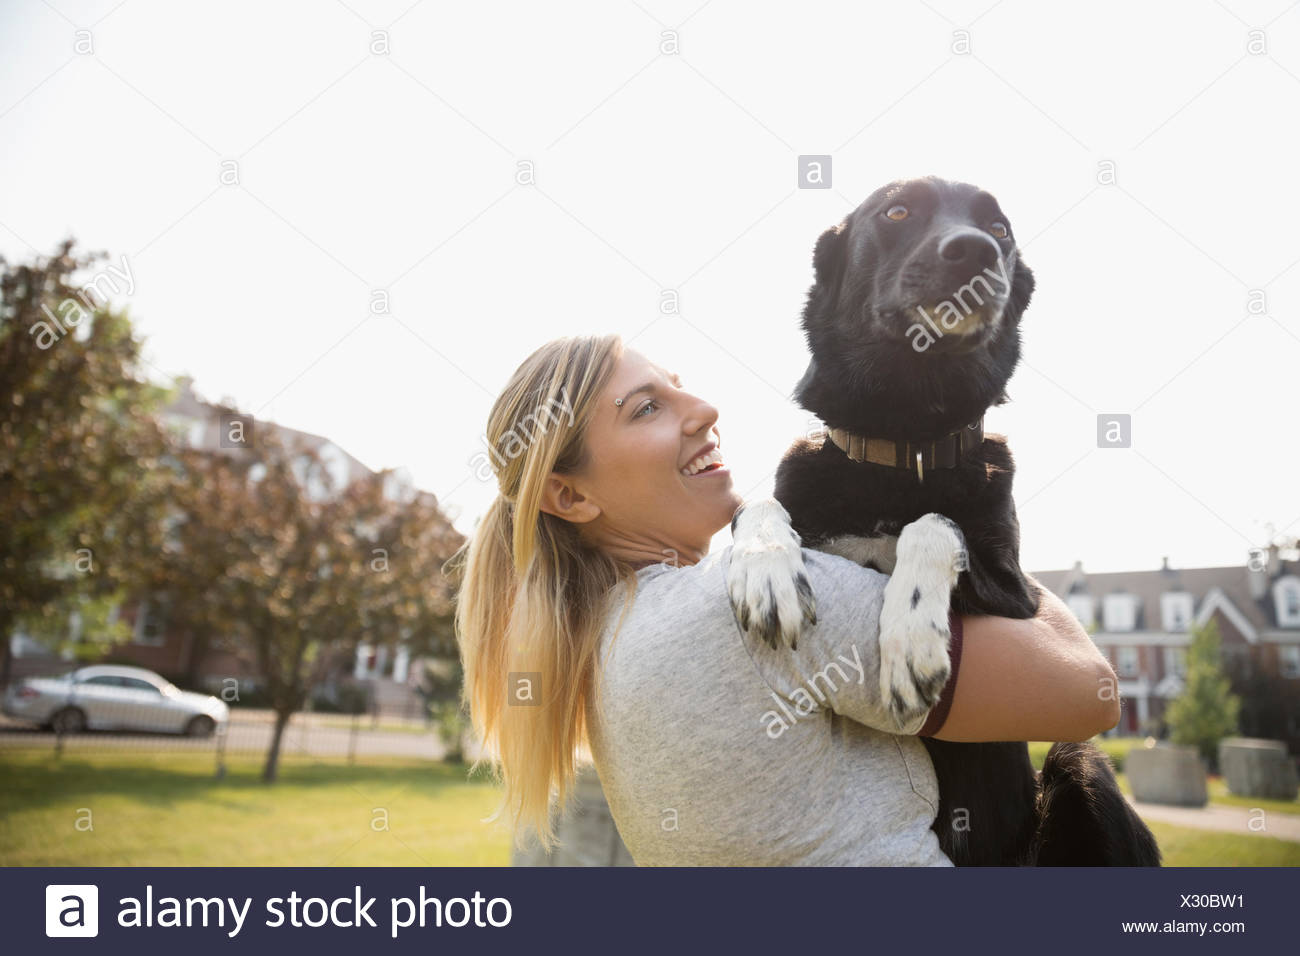 Hembra holding dueño de la mascota perro en park Imagen De Stock